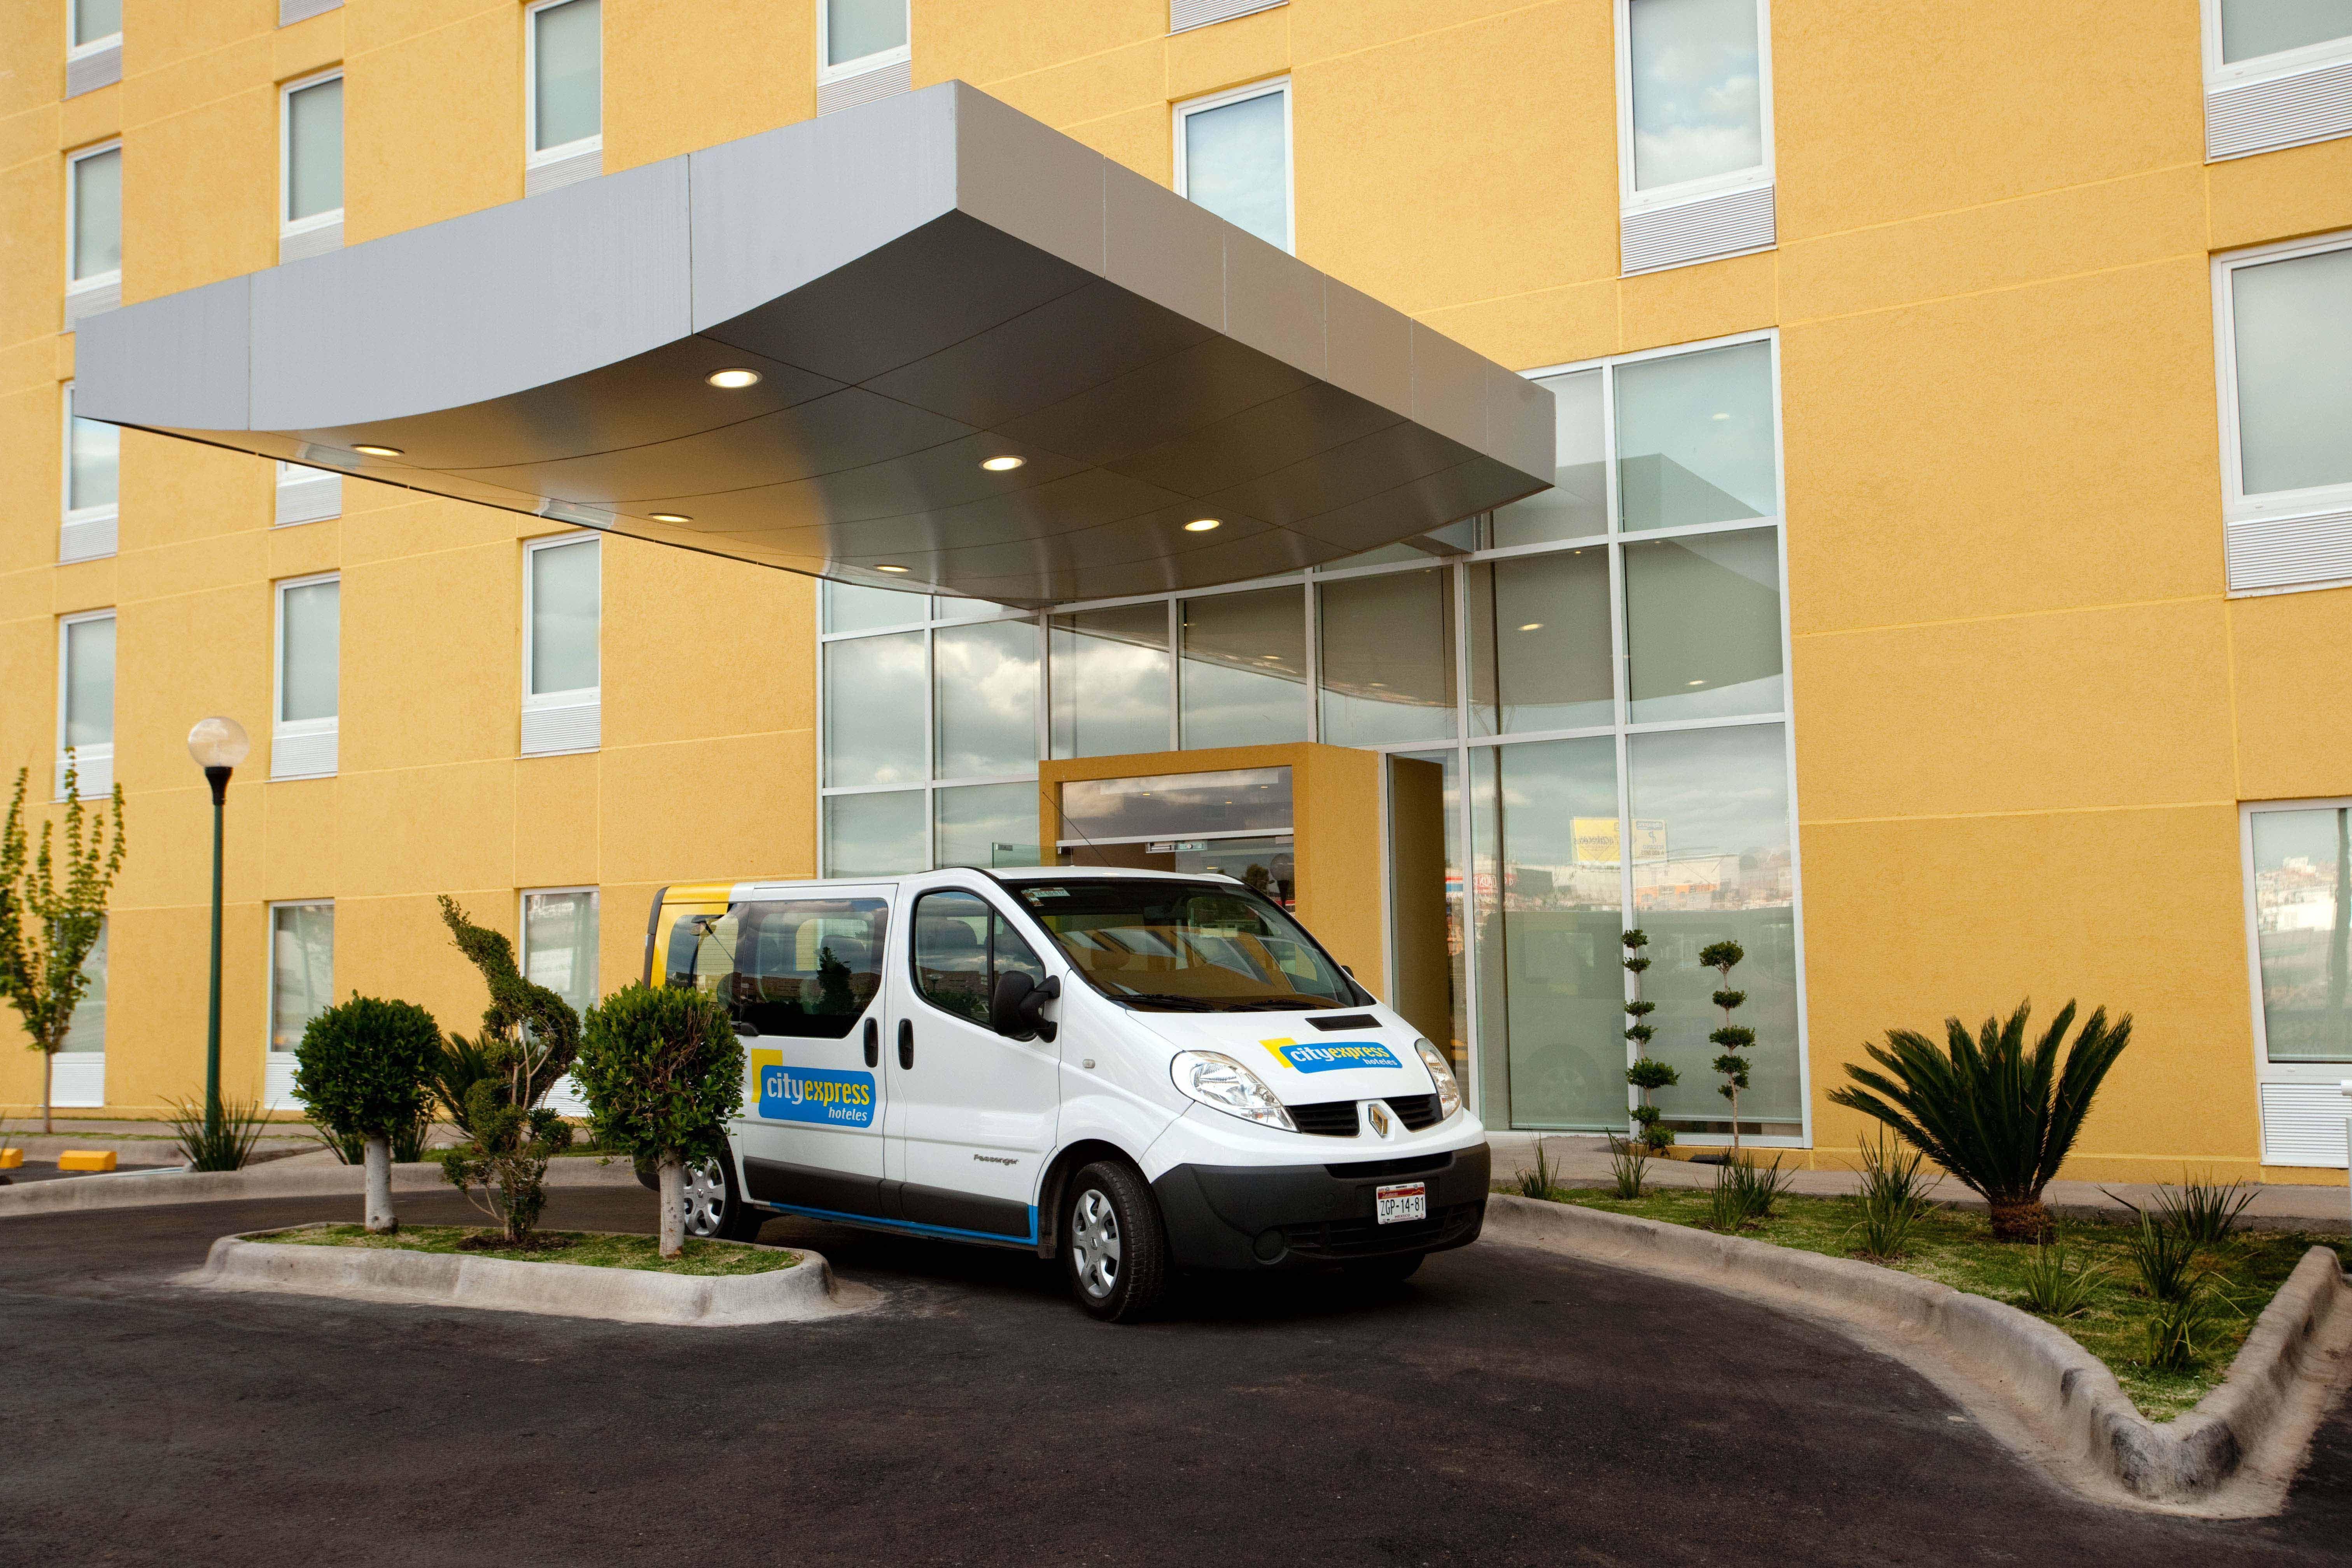 Servicio de transporte gratuito (5 km a la redonda) - City Express Zacatecas